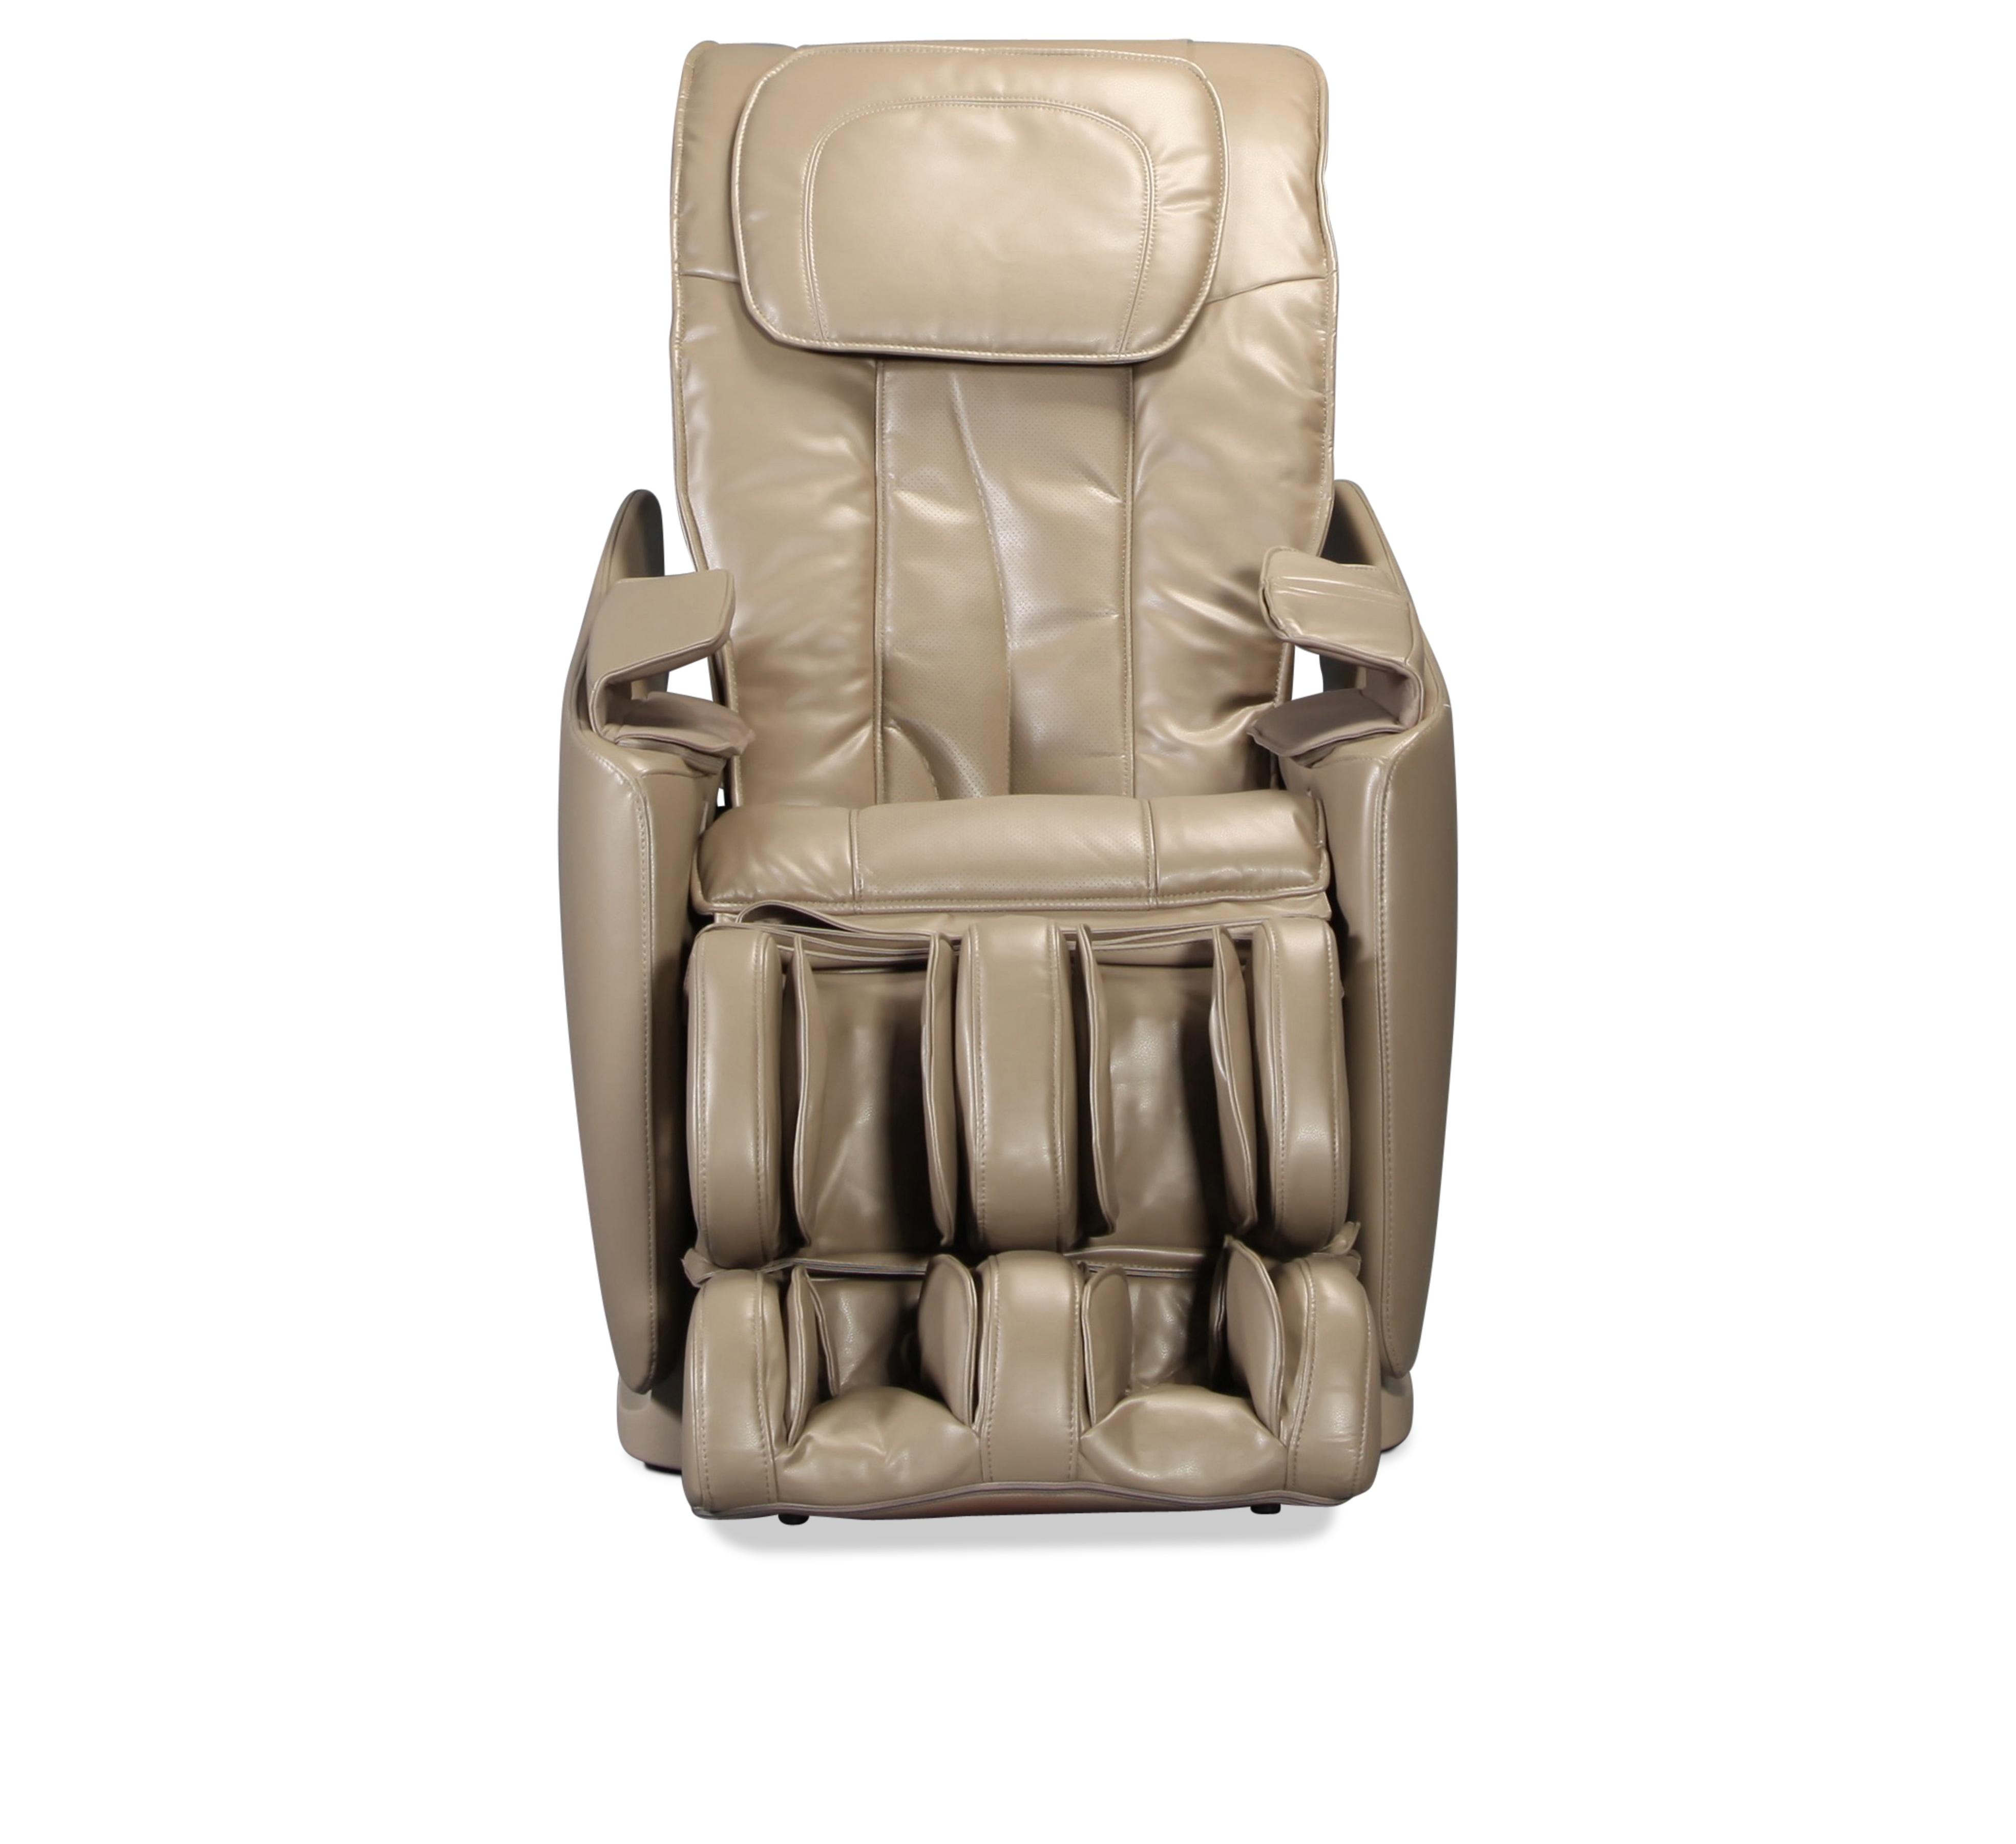 Axum Robotic Massage Chair